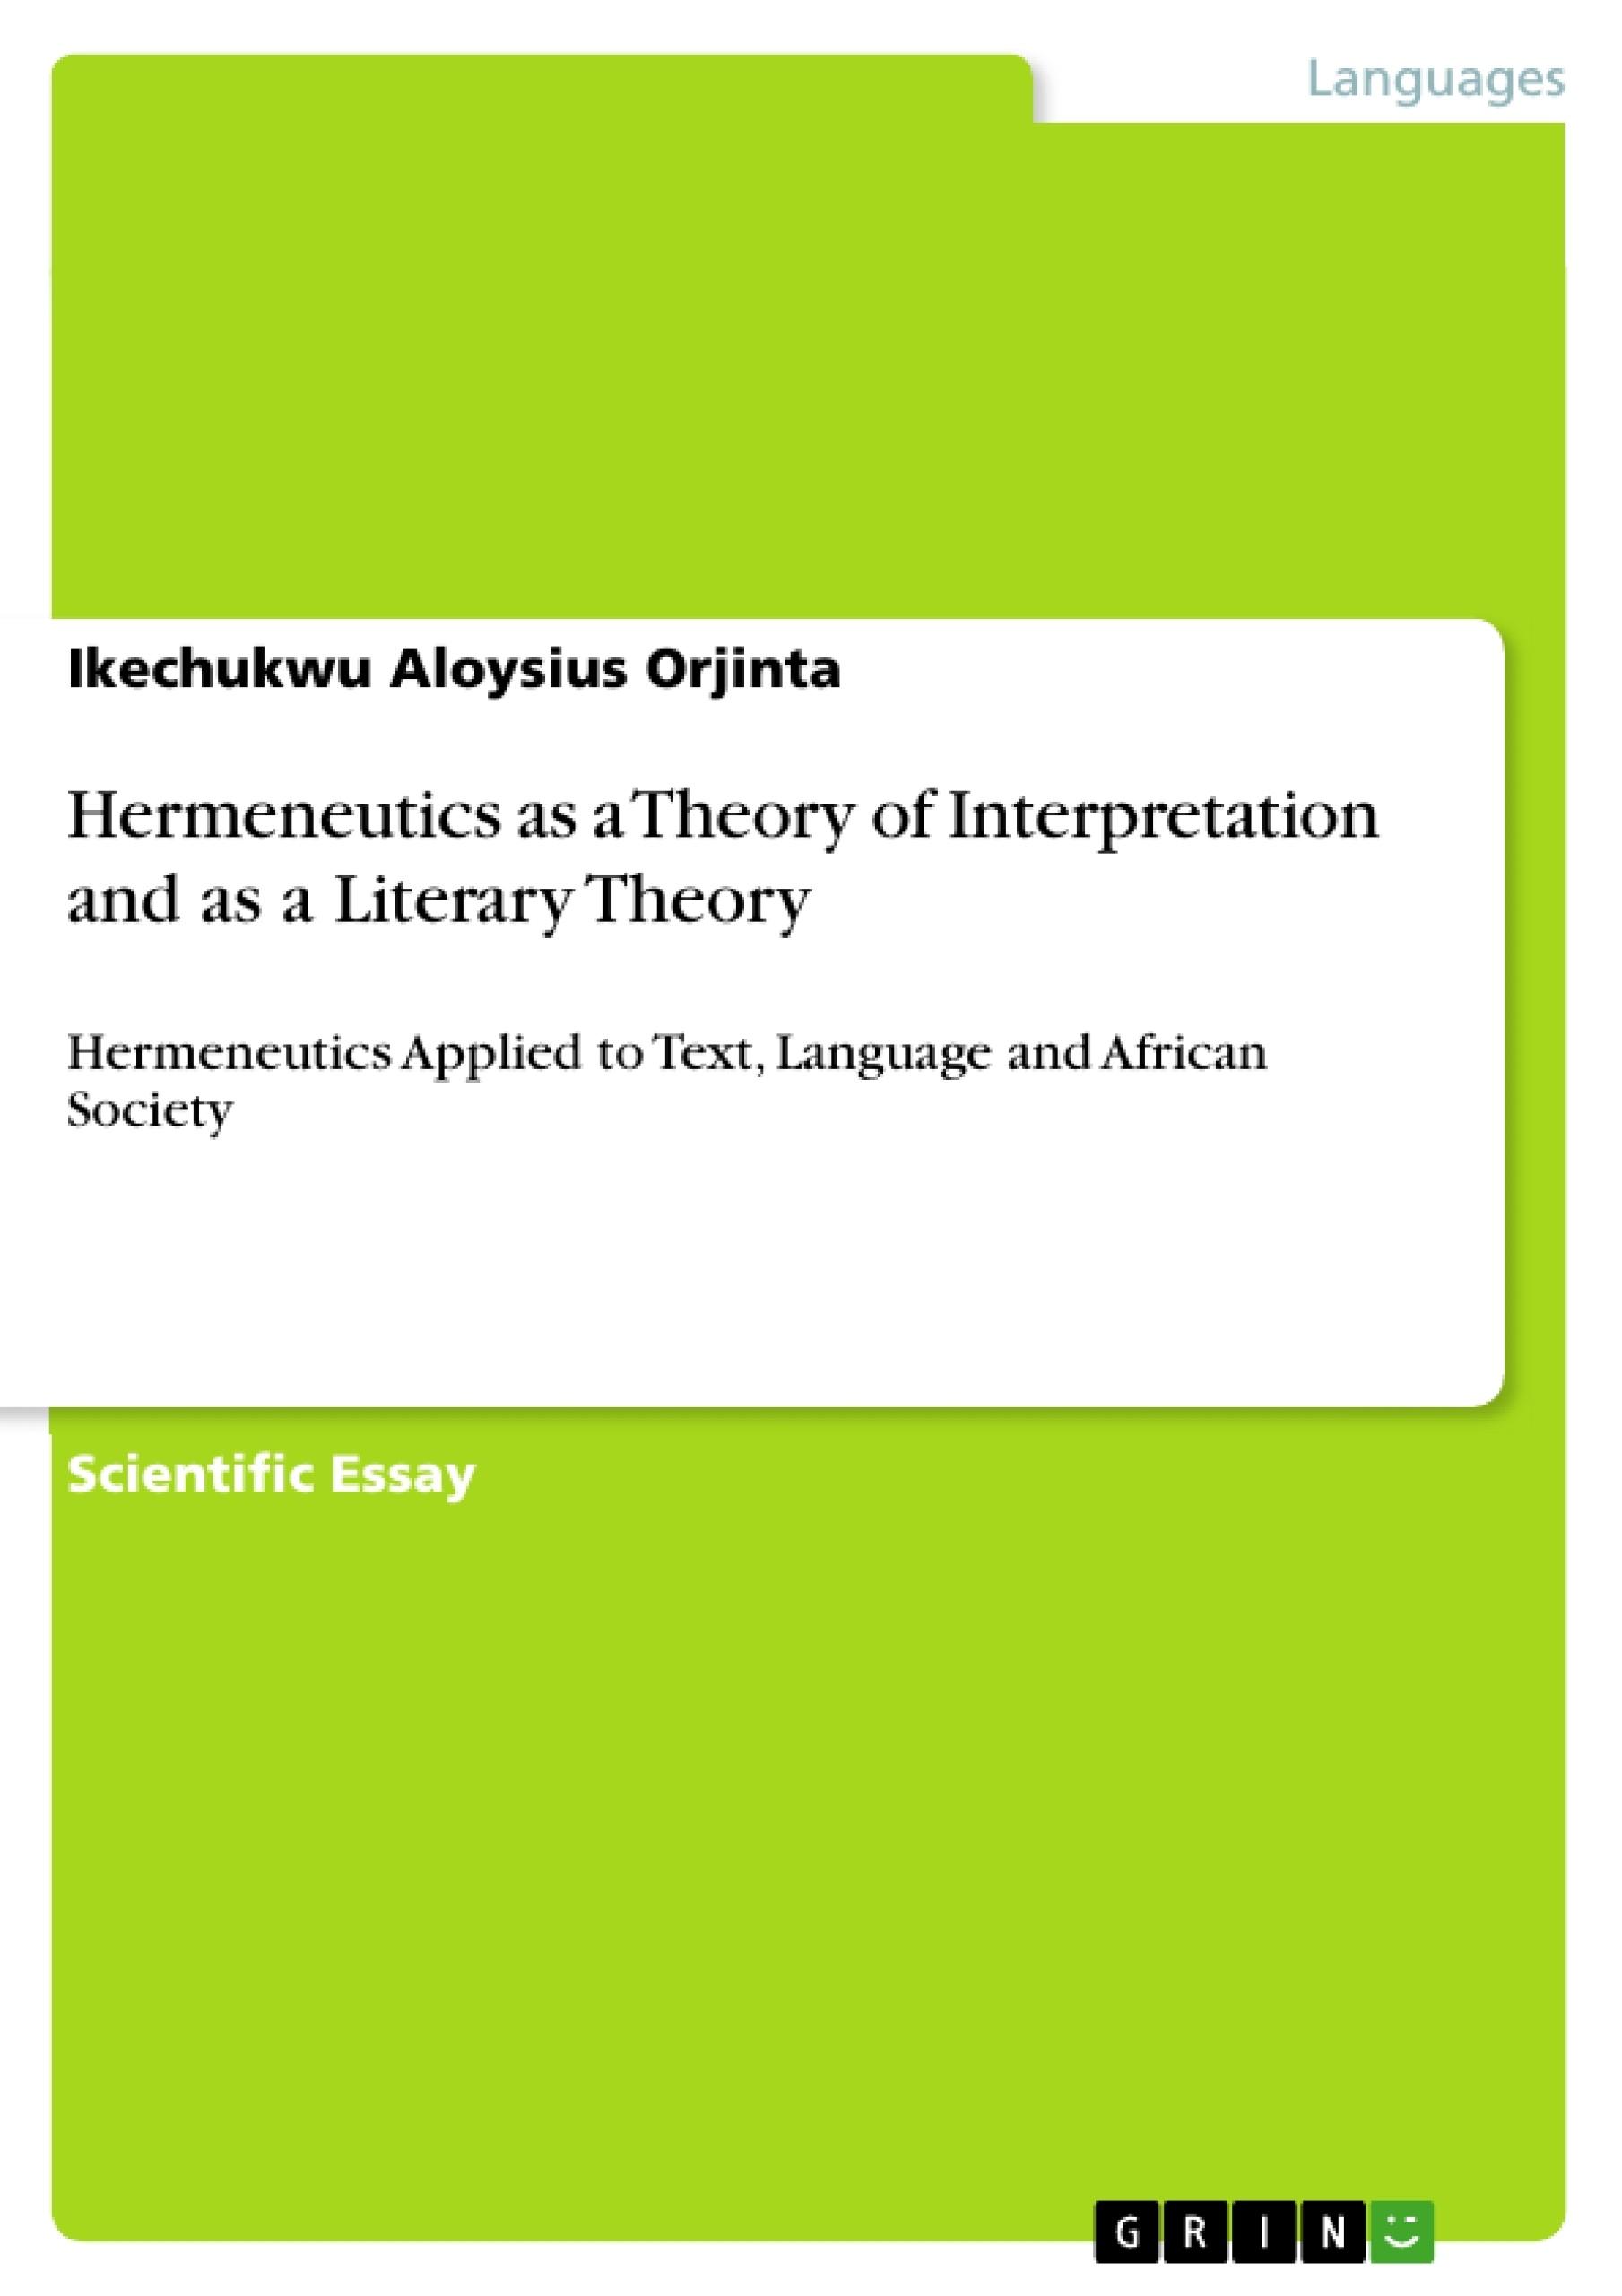 Title: Hermeneutics as a Theory of Interpretation and as a Literary Theory